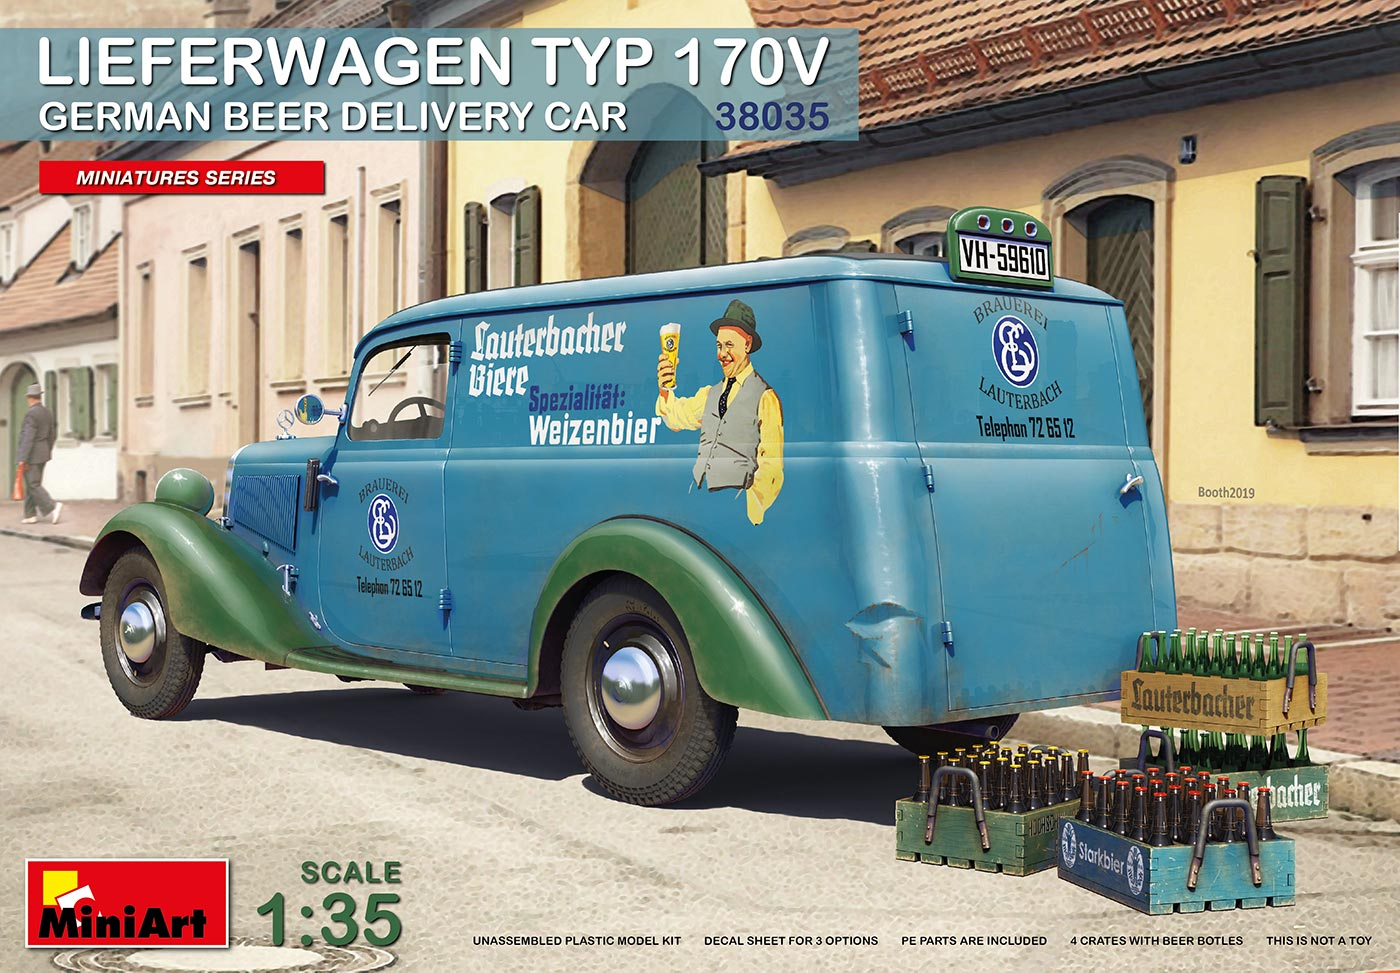 MiniArt Lieferwagen Typ 170V German Beer Delivery Car